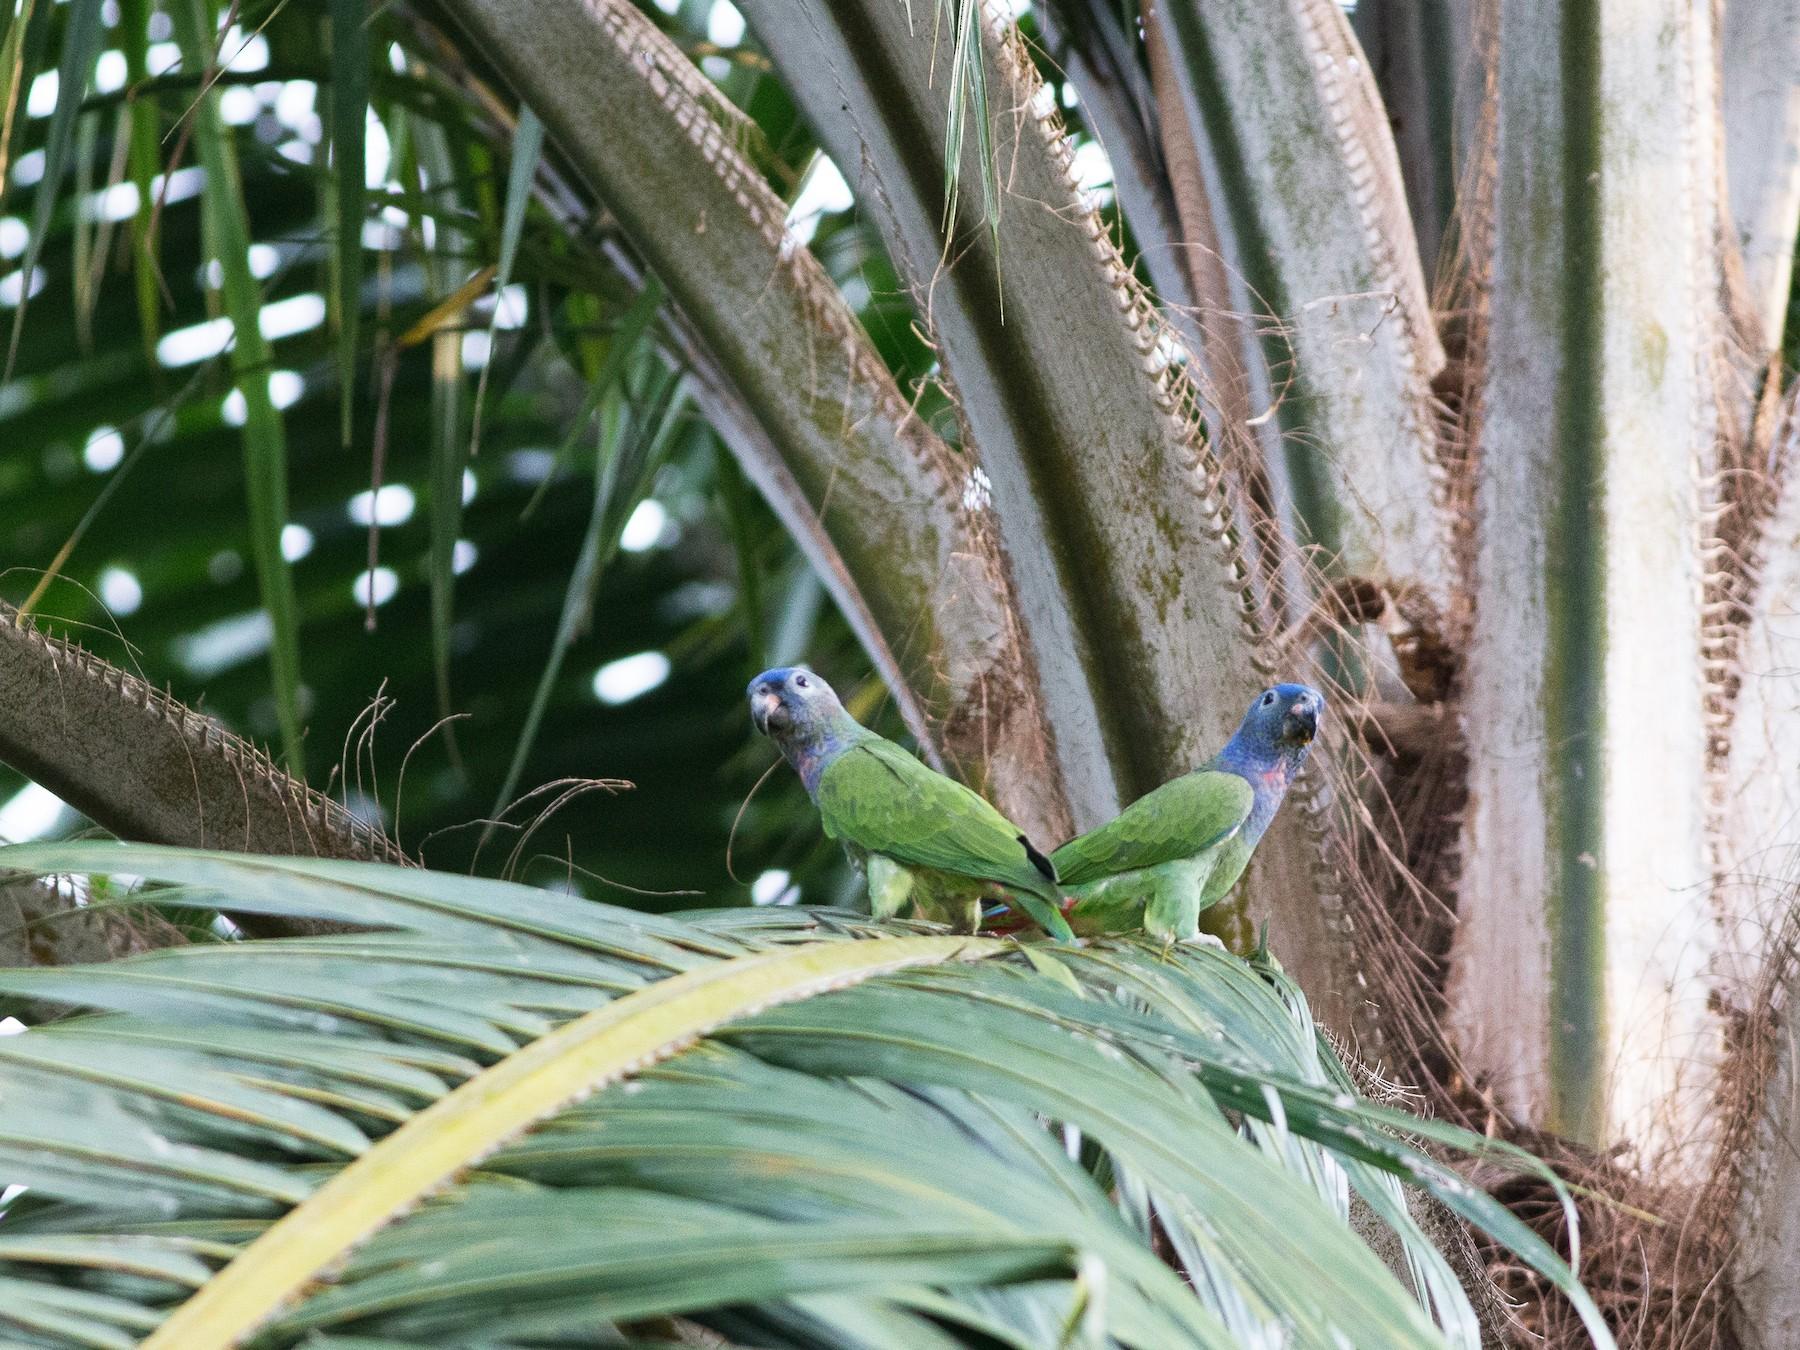 Blue-headed Parrot - Chris Wood